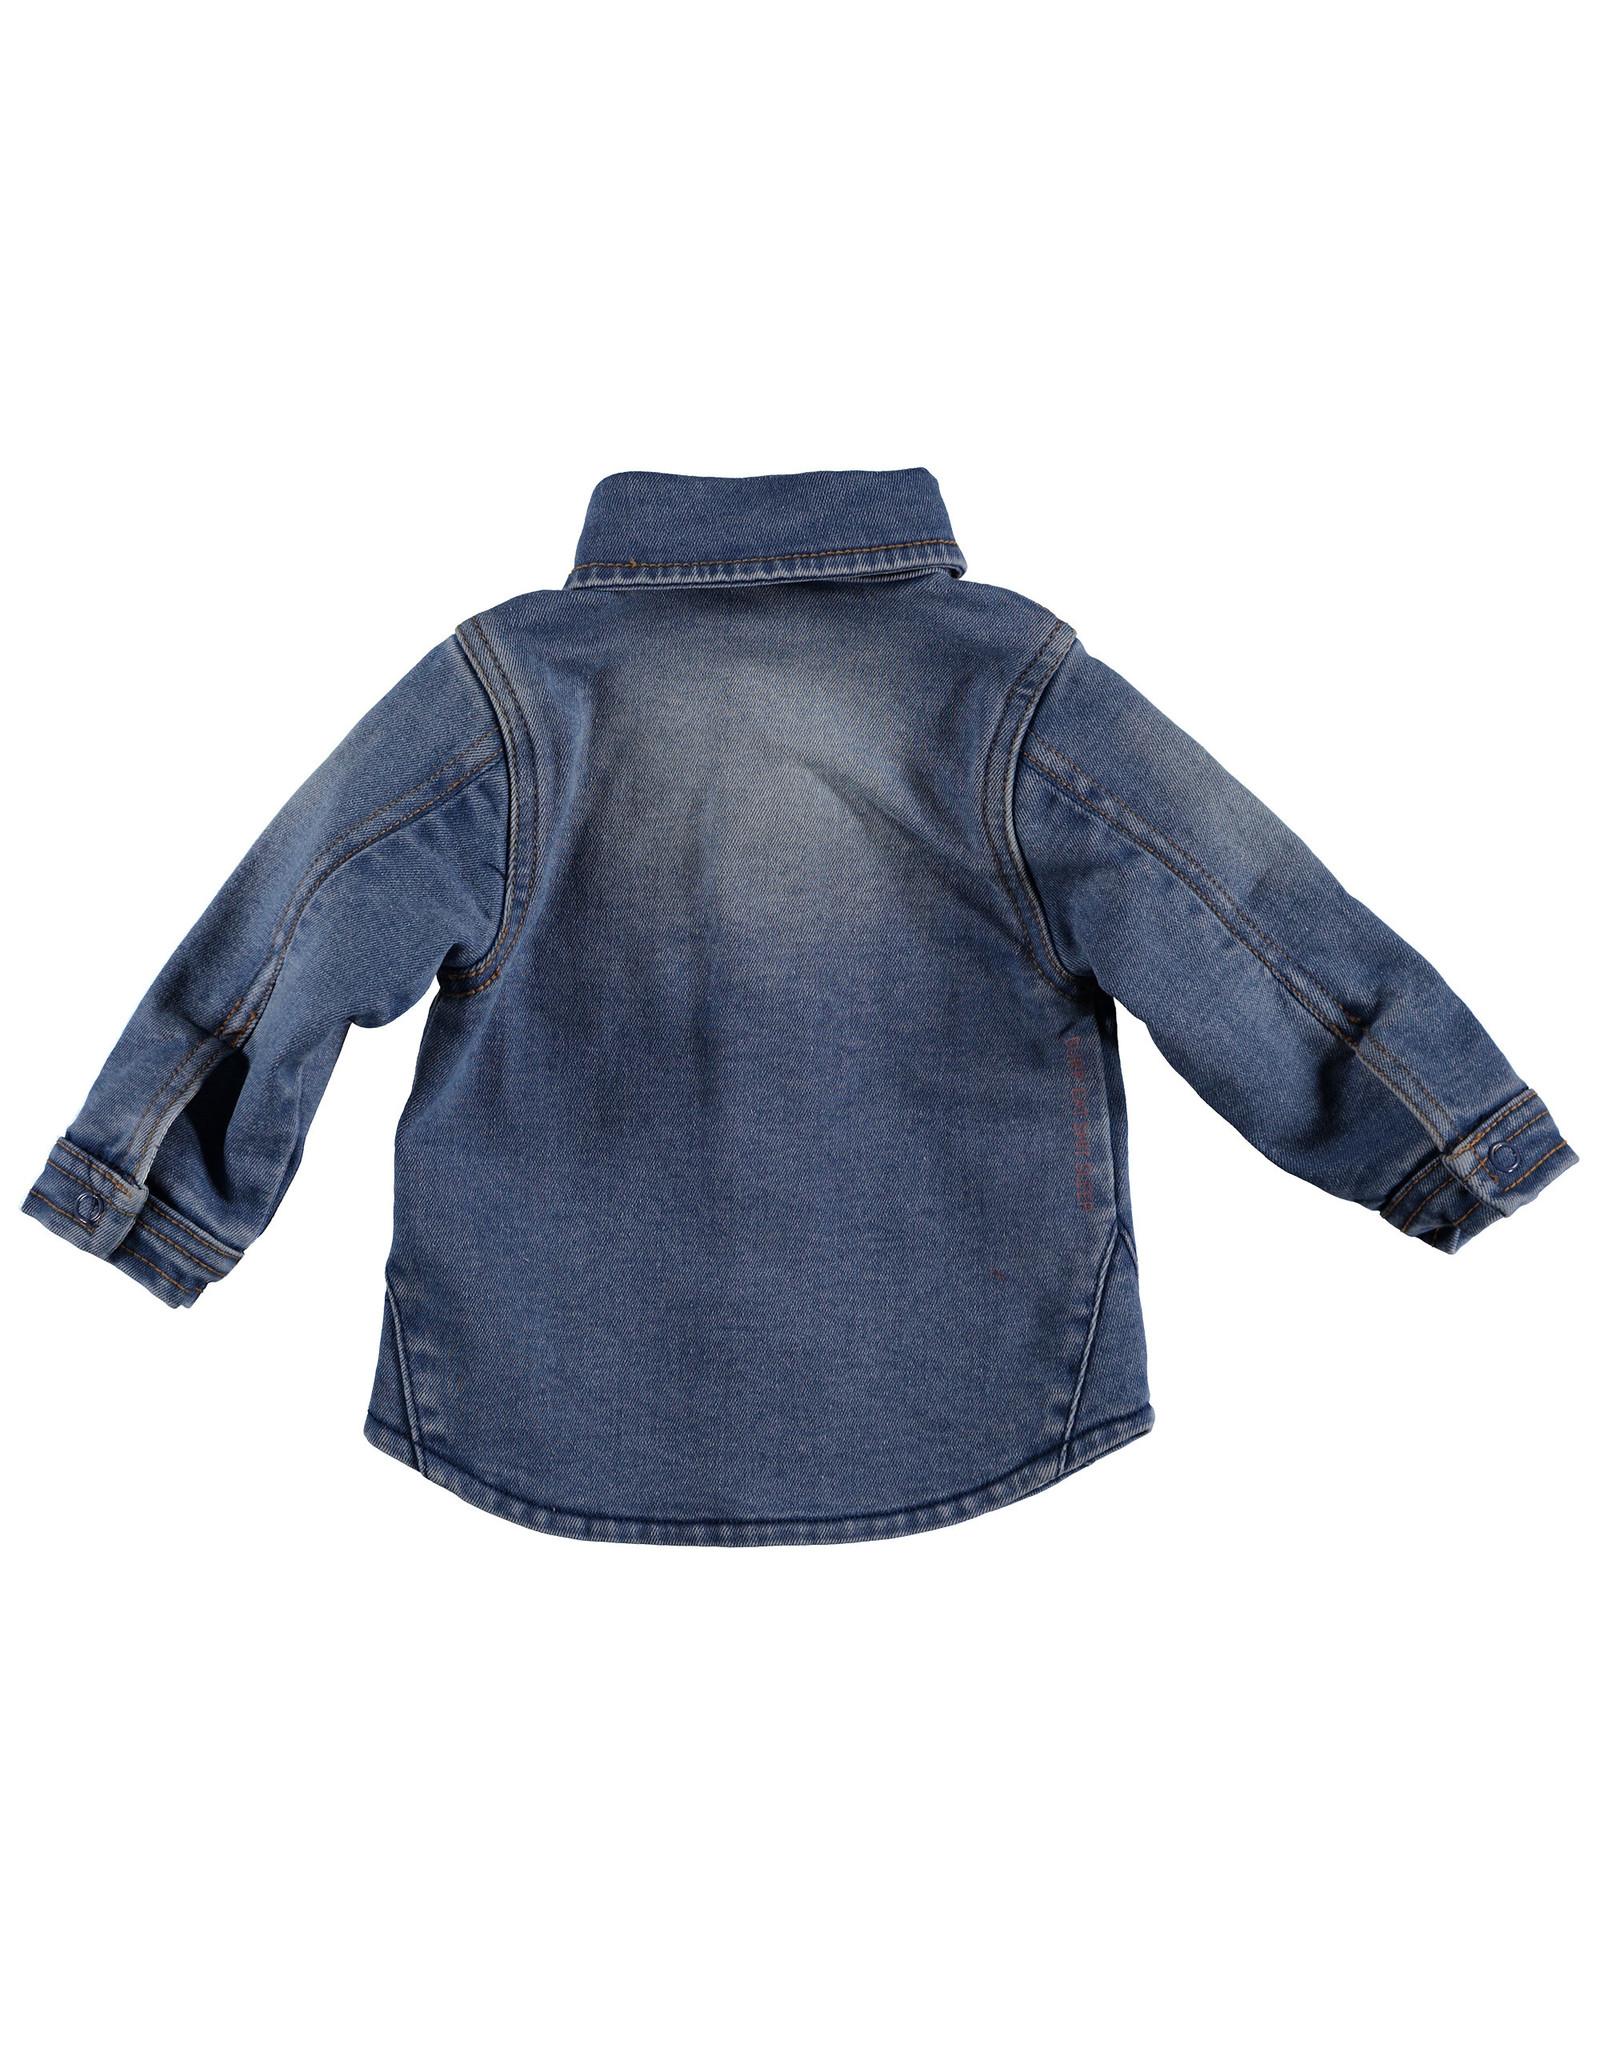 B.E.S.S blouse denim